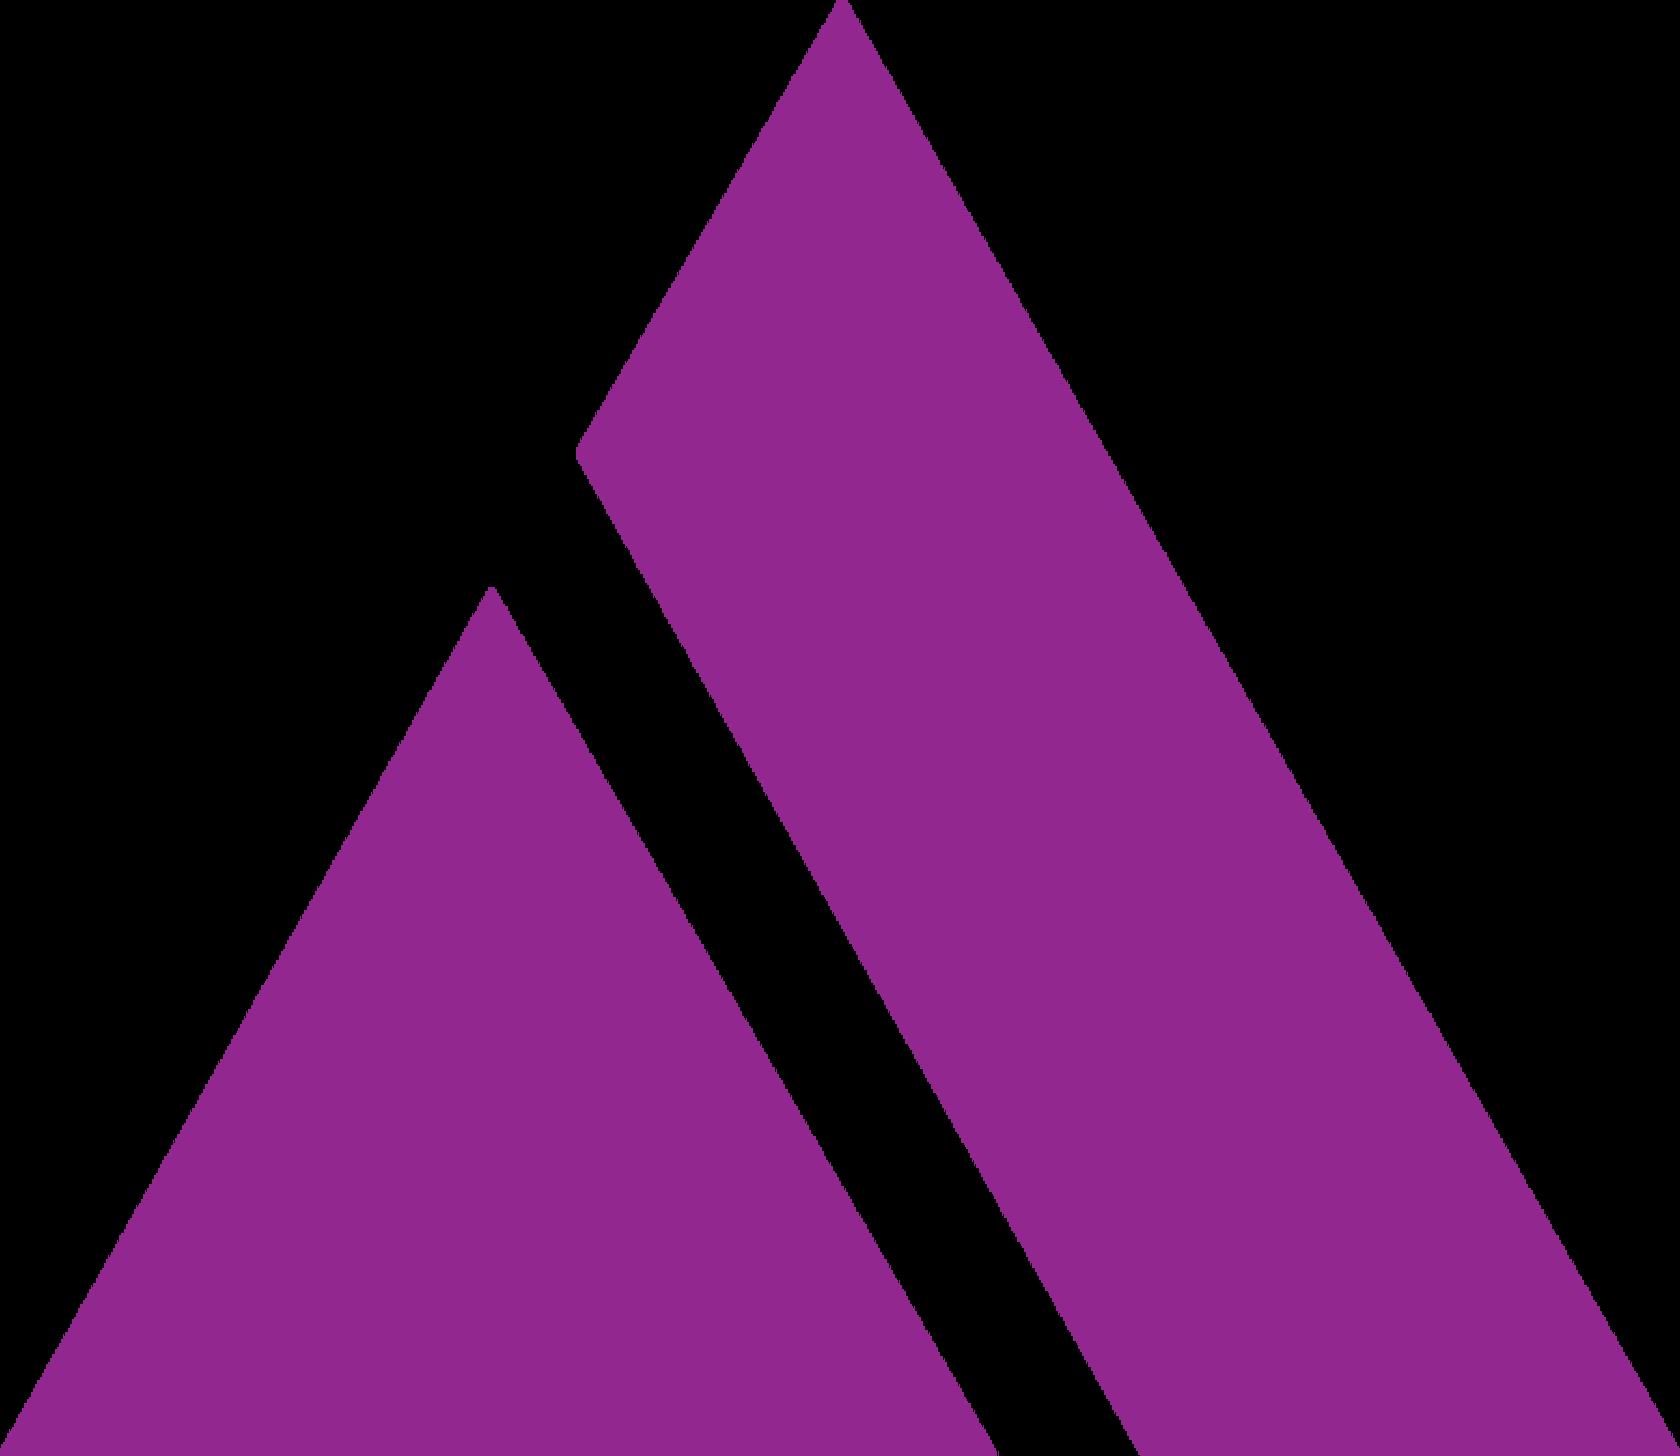 A-sektionen